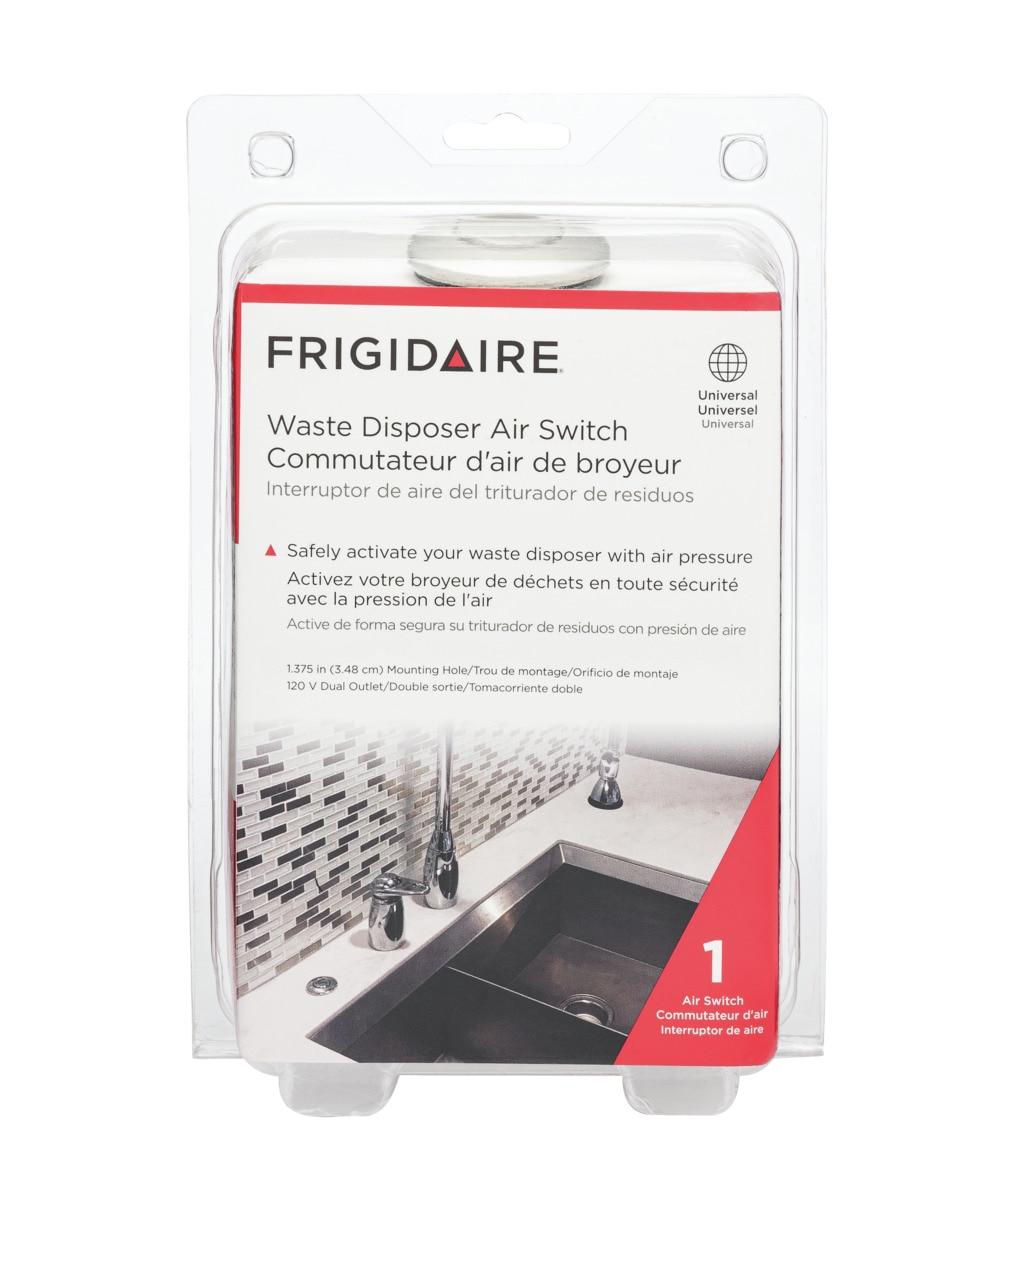 Frigidaire Waste Disposer Air Switch